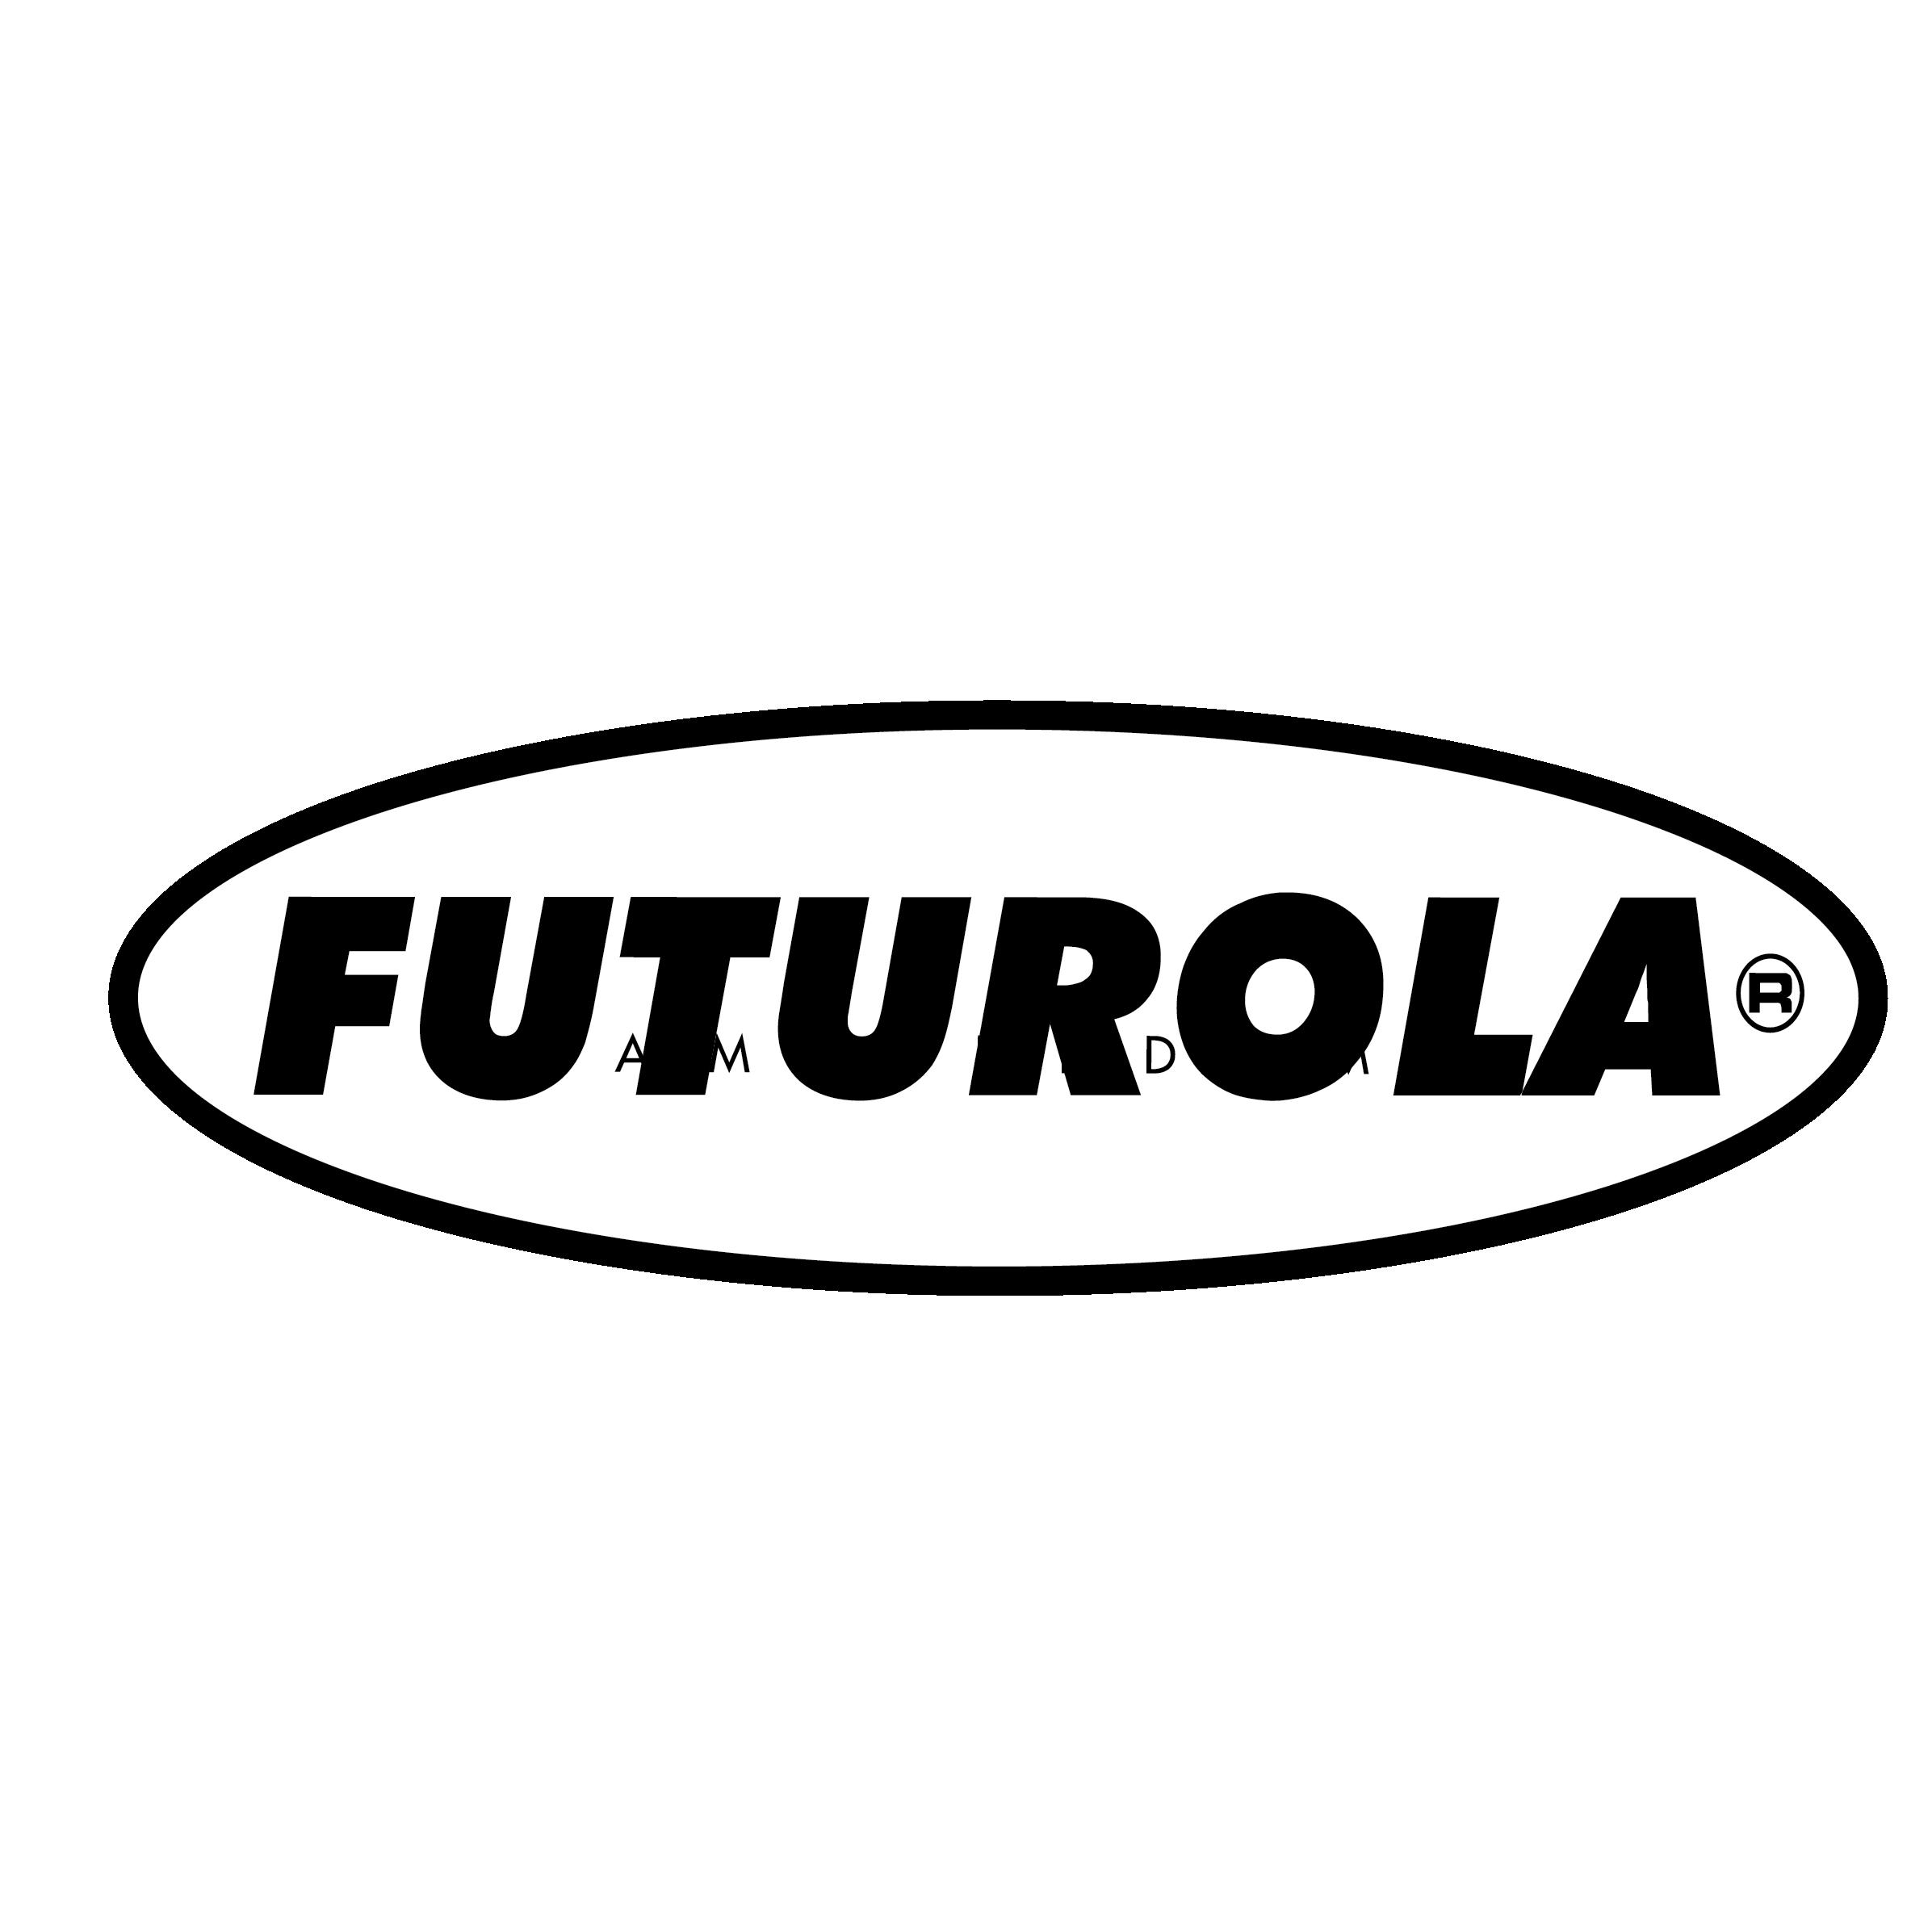 Futurola